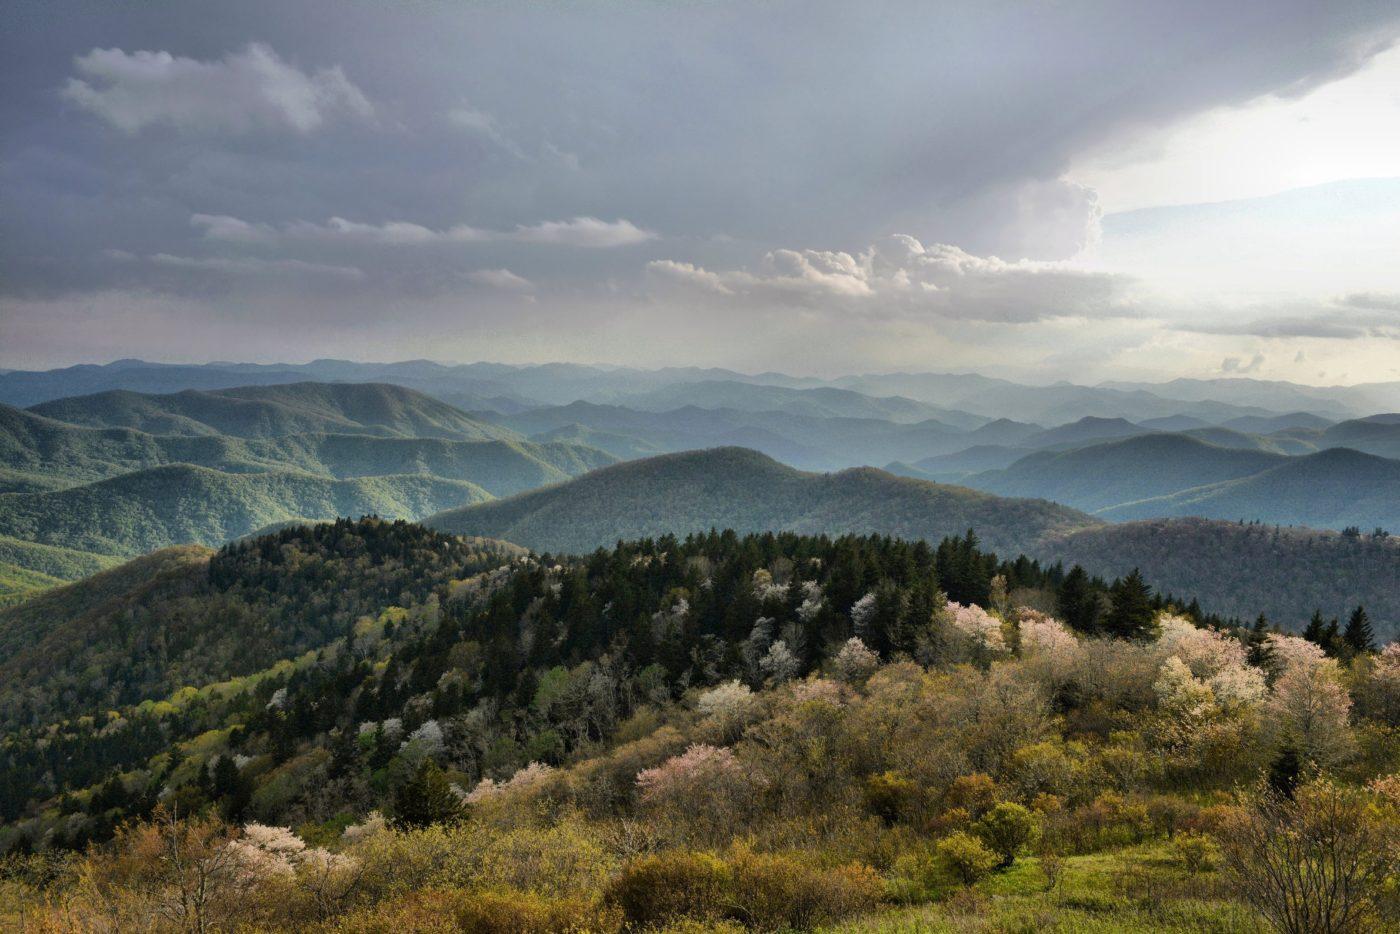 Photo of Survival school wilderness location in Blue Ridge Mountains